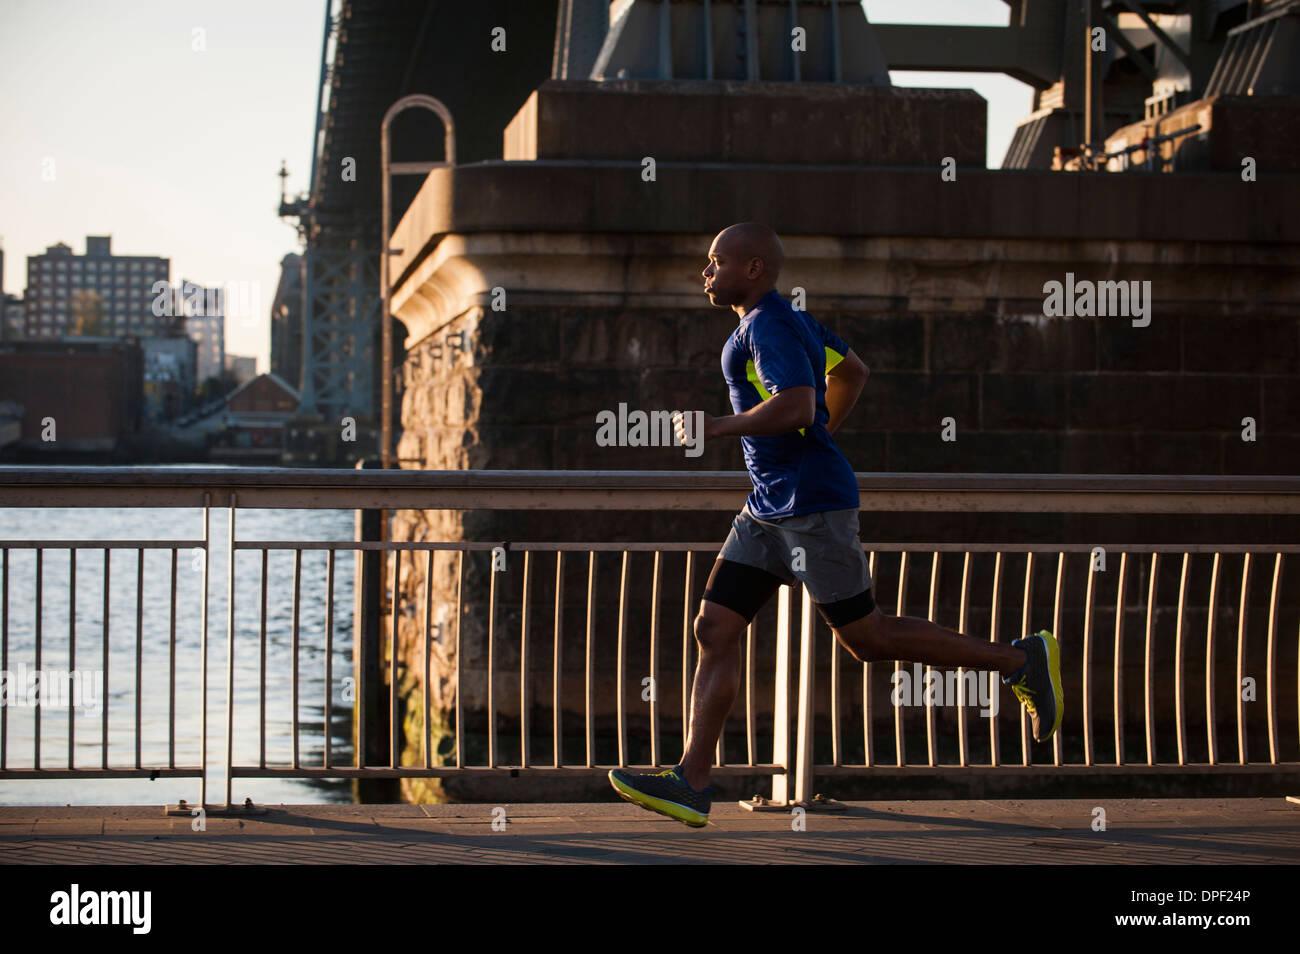 Man jogging on sidewalk - Stock Image